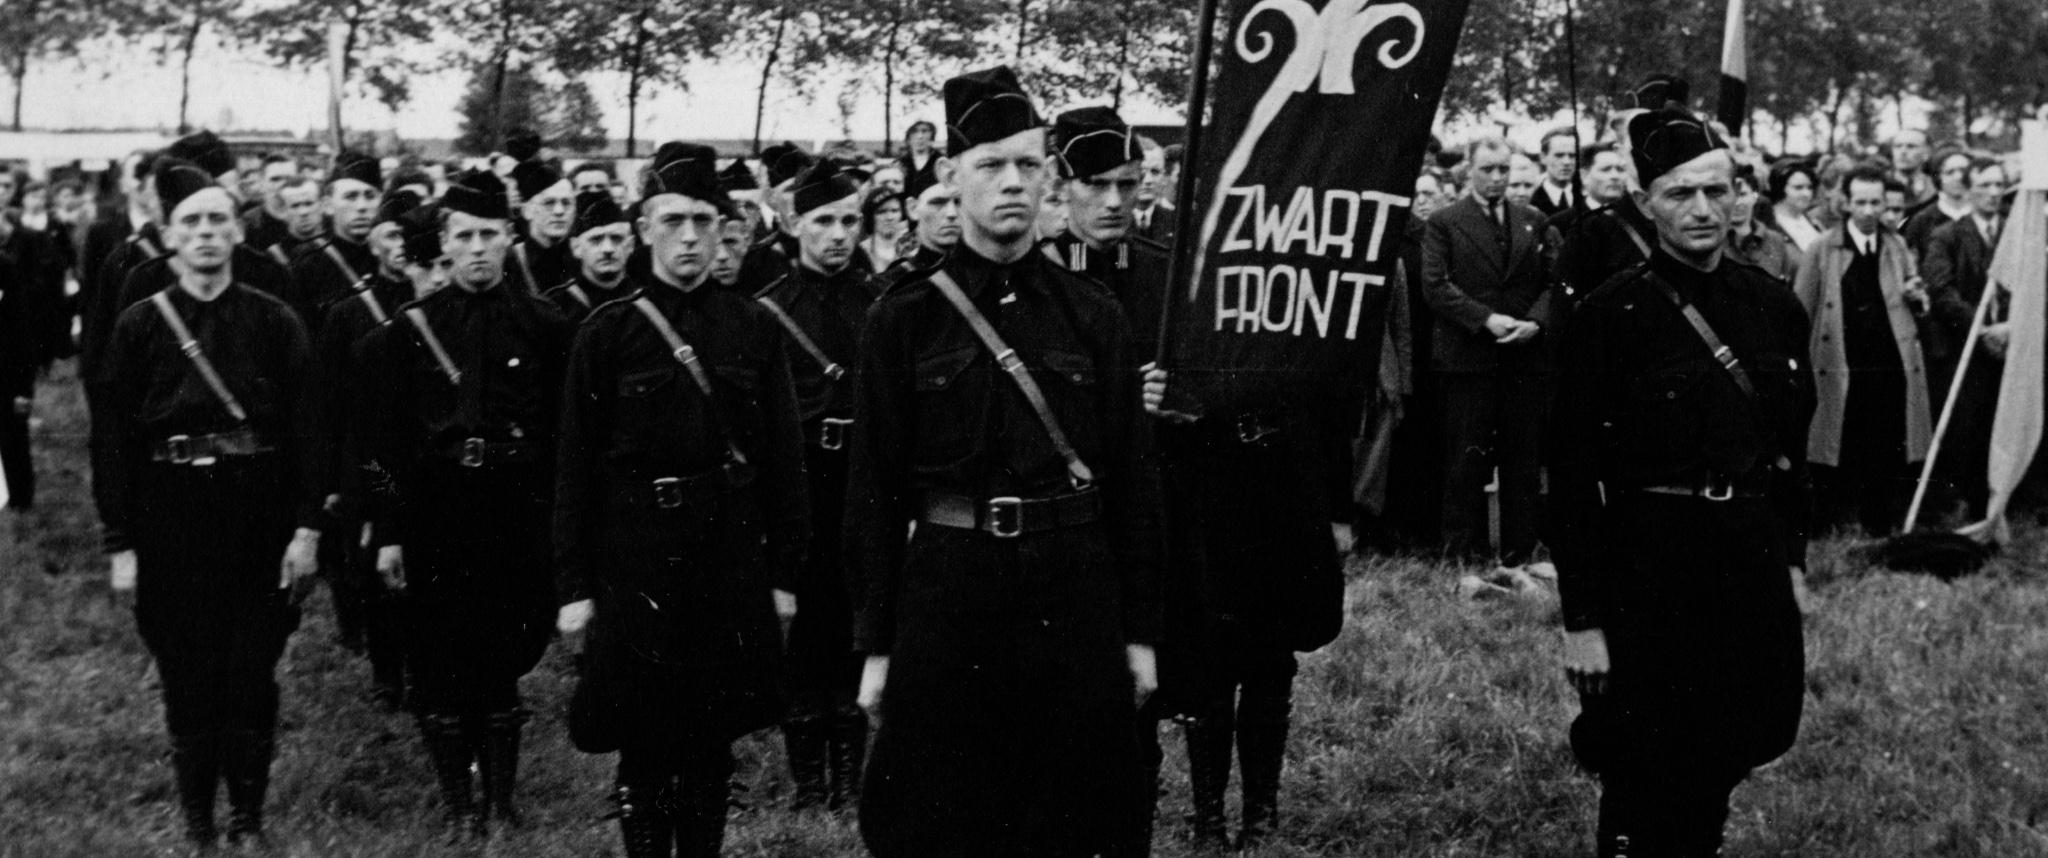 Fascism, Arnold Meijer, Zwart Front, Black front, Black Stormers, black shirts, Brabant, Oisterwijk, day of the country, weerkorps, militia, violence, politics, history